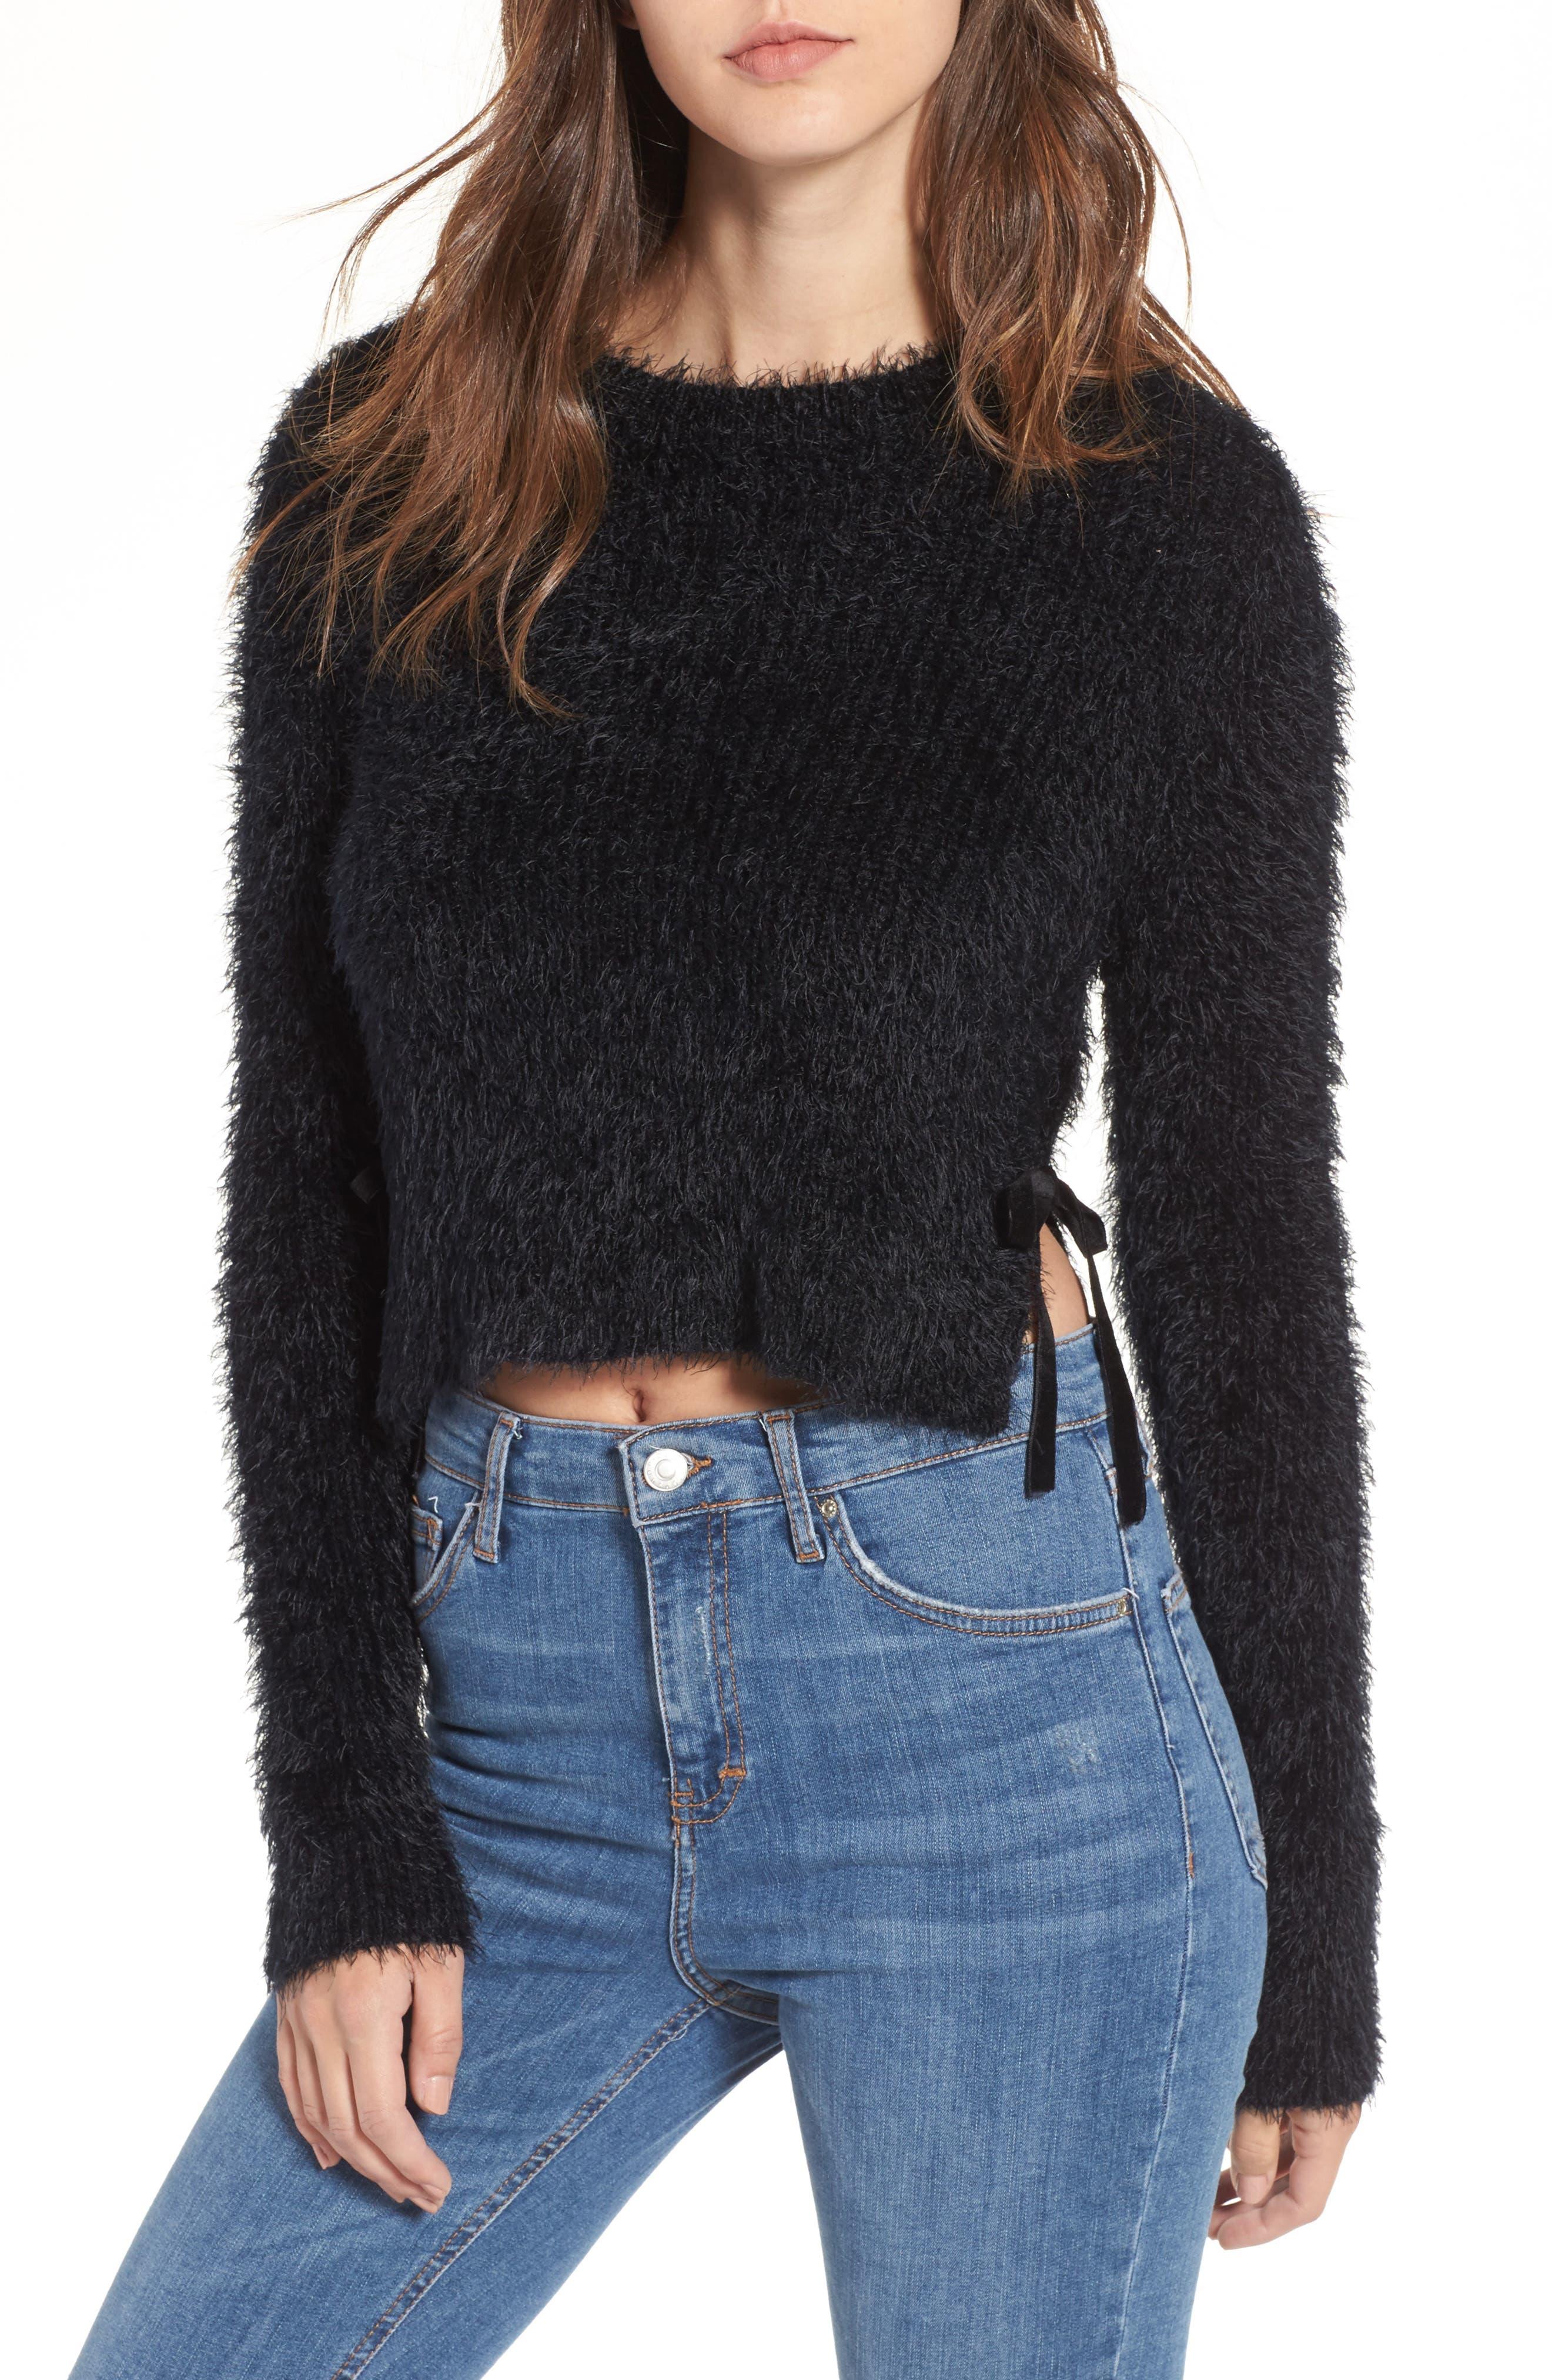 MAJORELLE Majesty Tie Crop Sweater, Main, color, 001